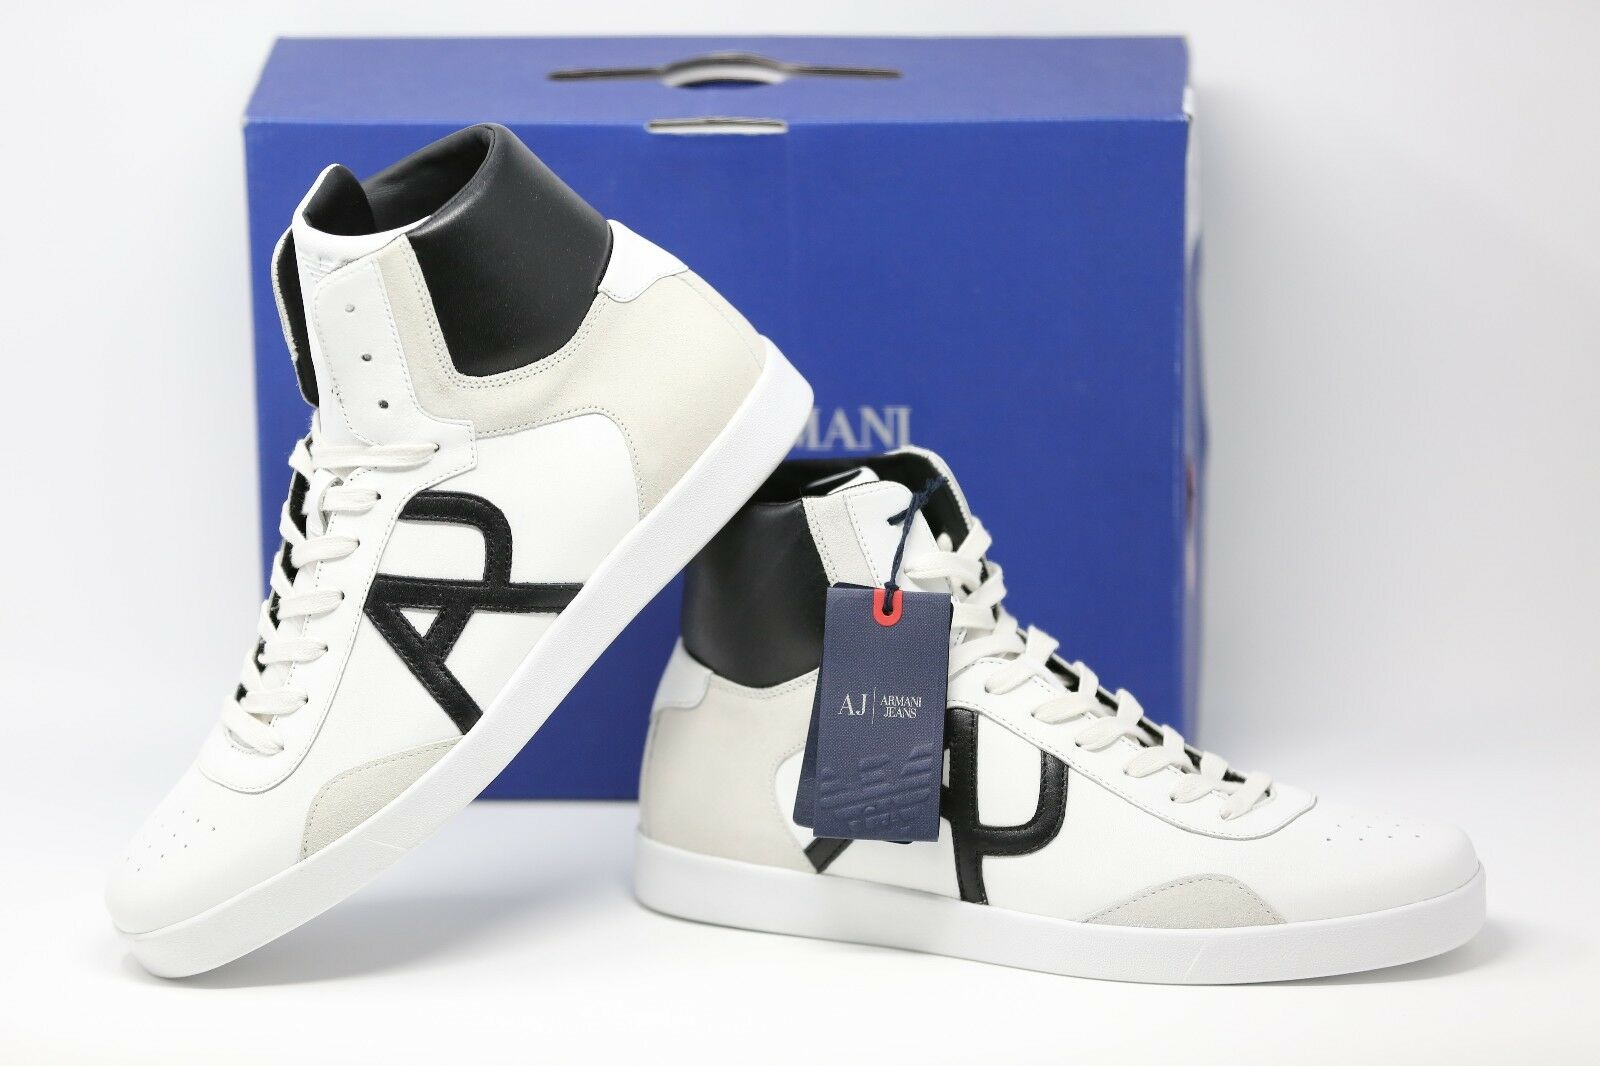 Armani Jeans Y1 Bianco Weiß schuhe Trainers UK 10.5 EUR 45